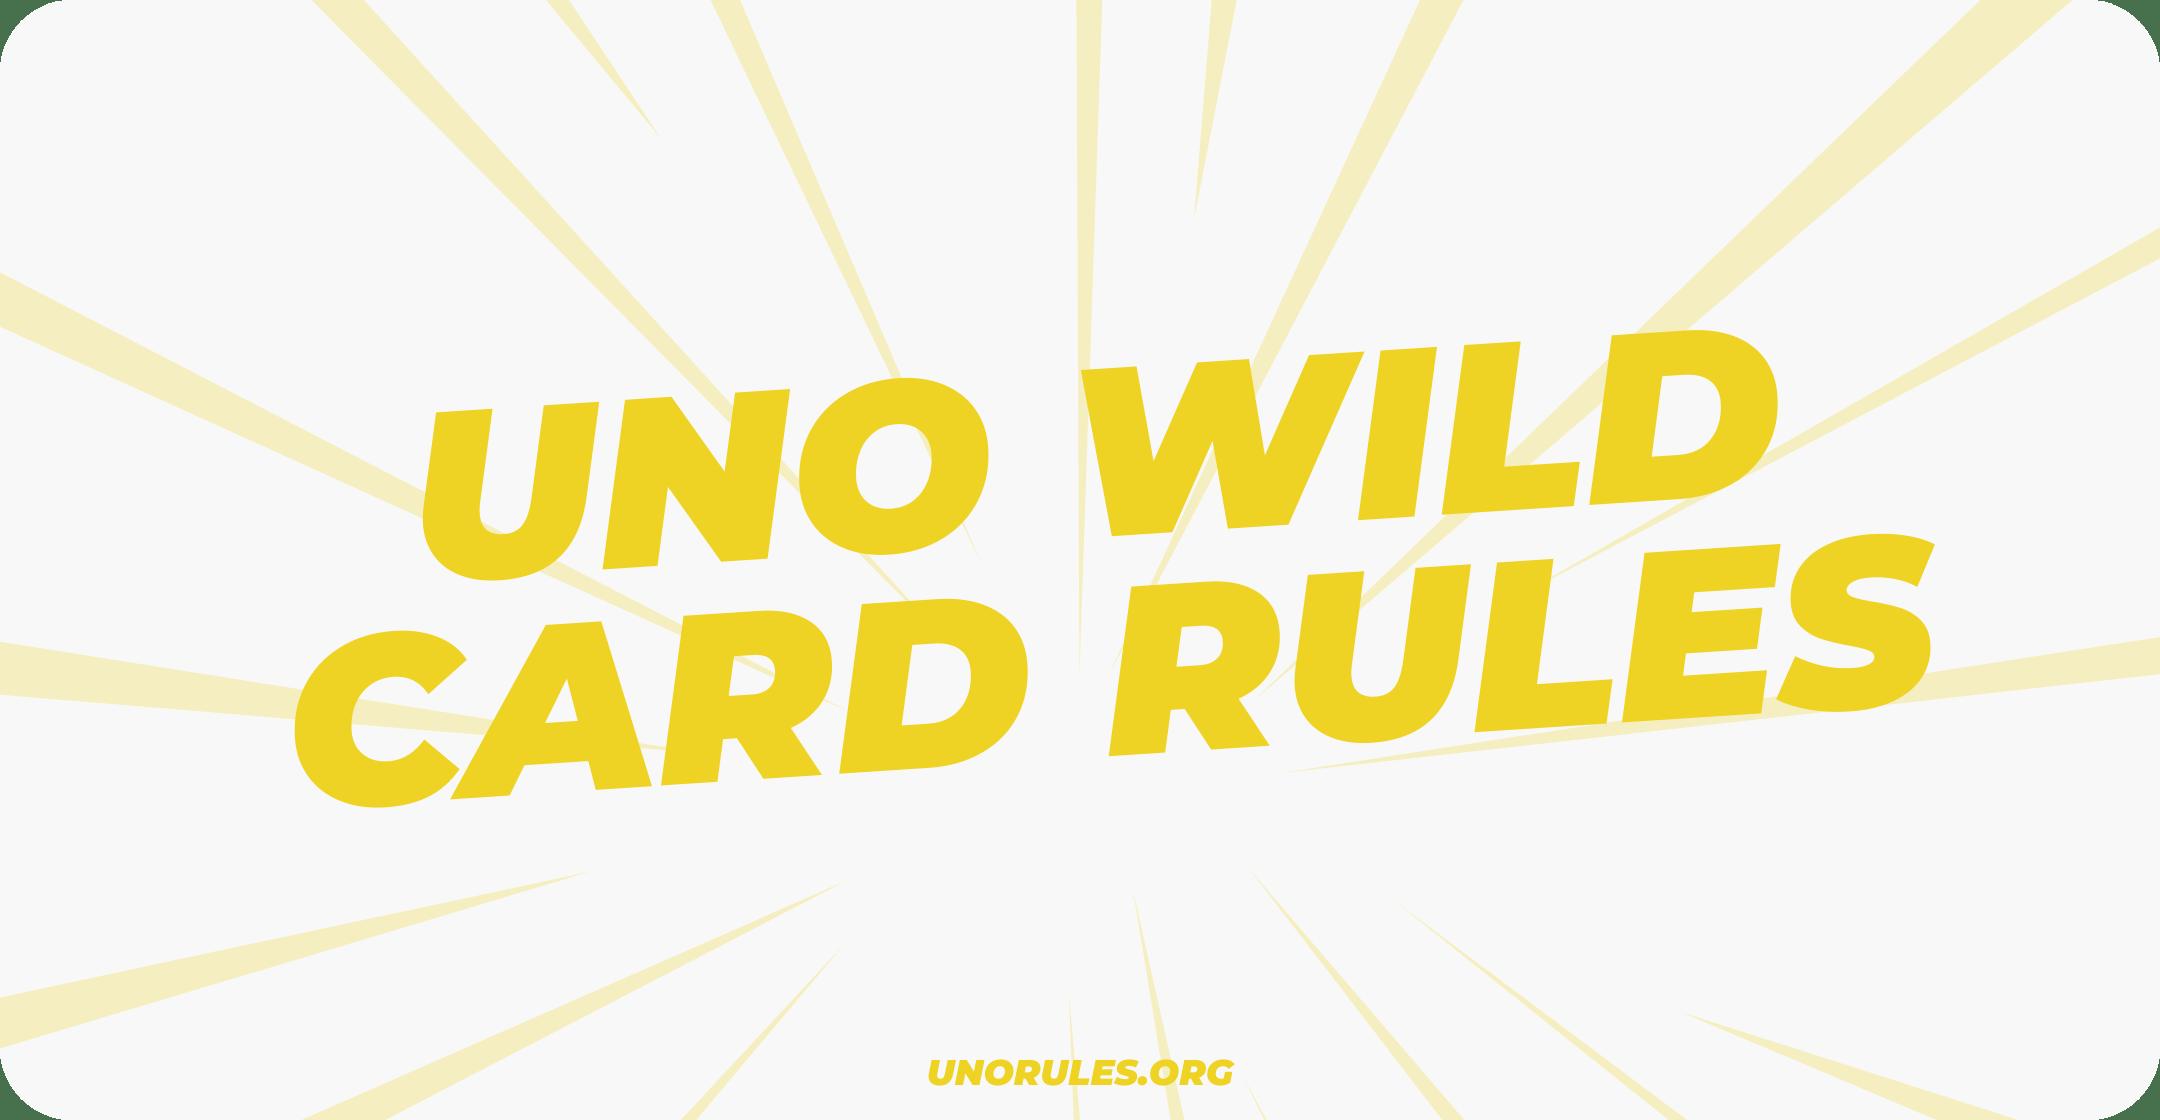 Uno Wild Card Rules